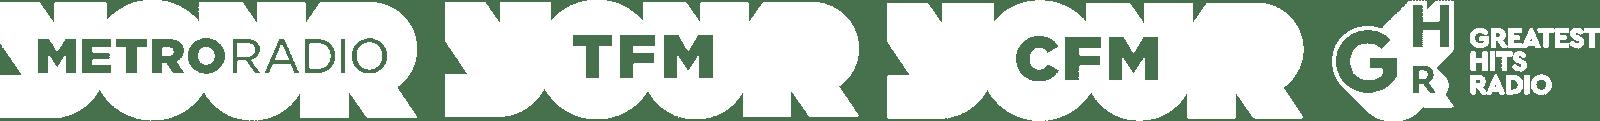 Metro Radio, TFM, CFM, Greatest Hits Radio